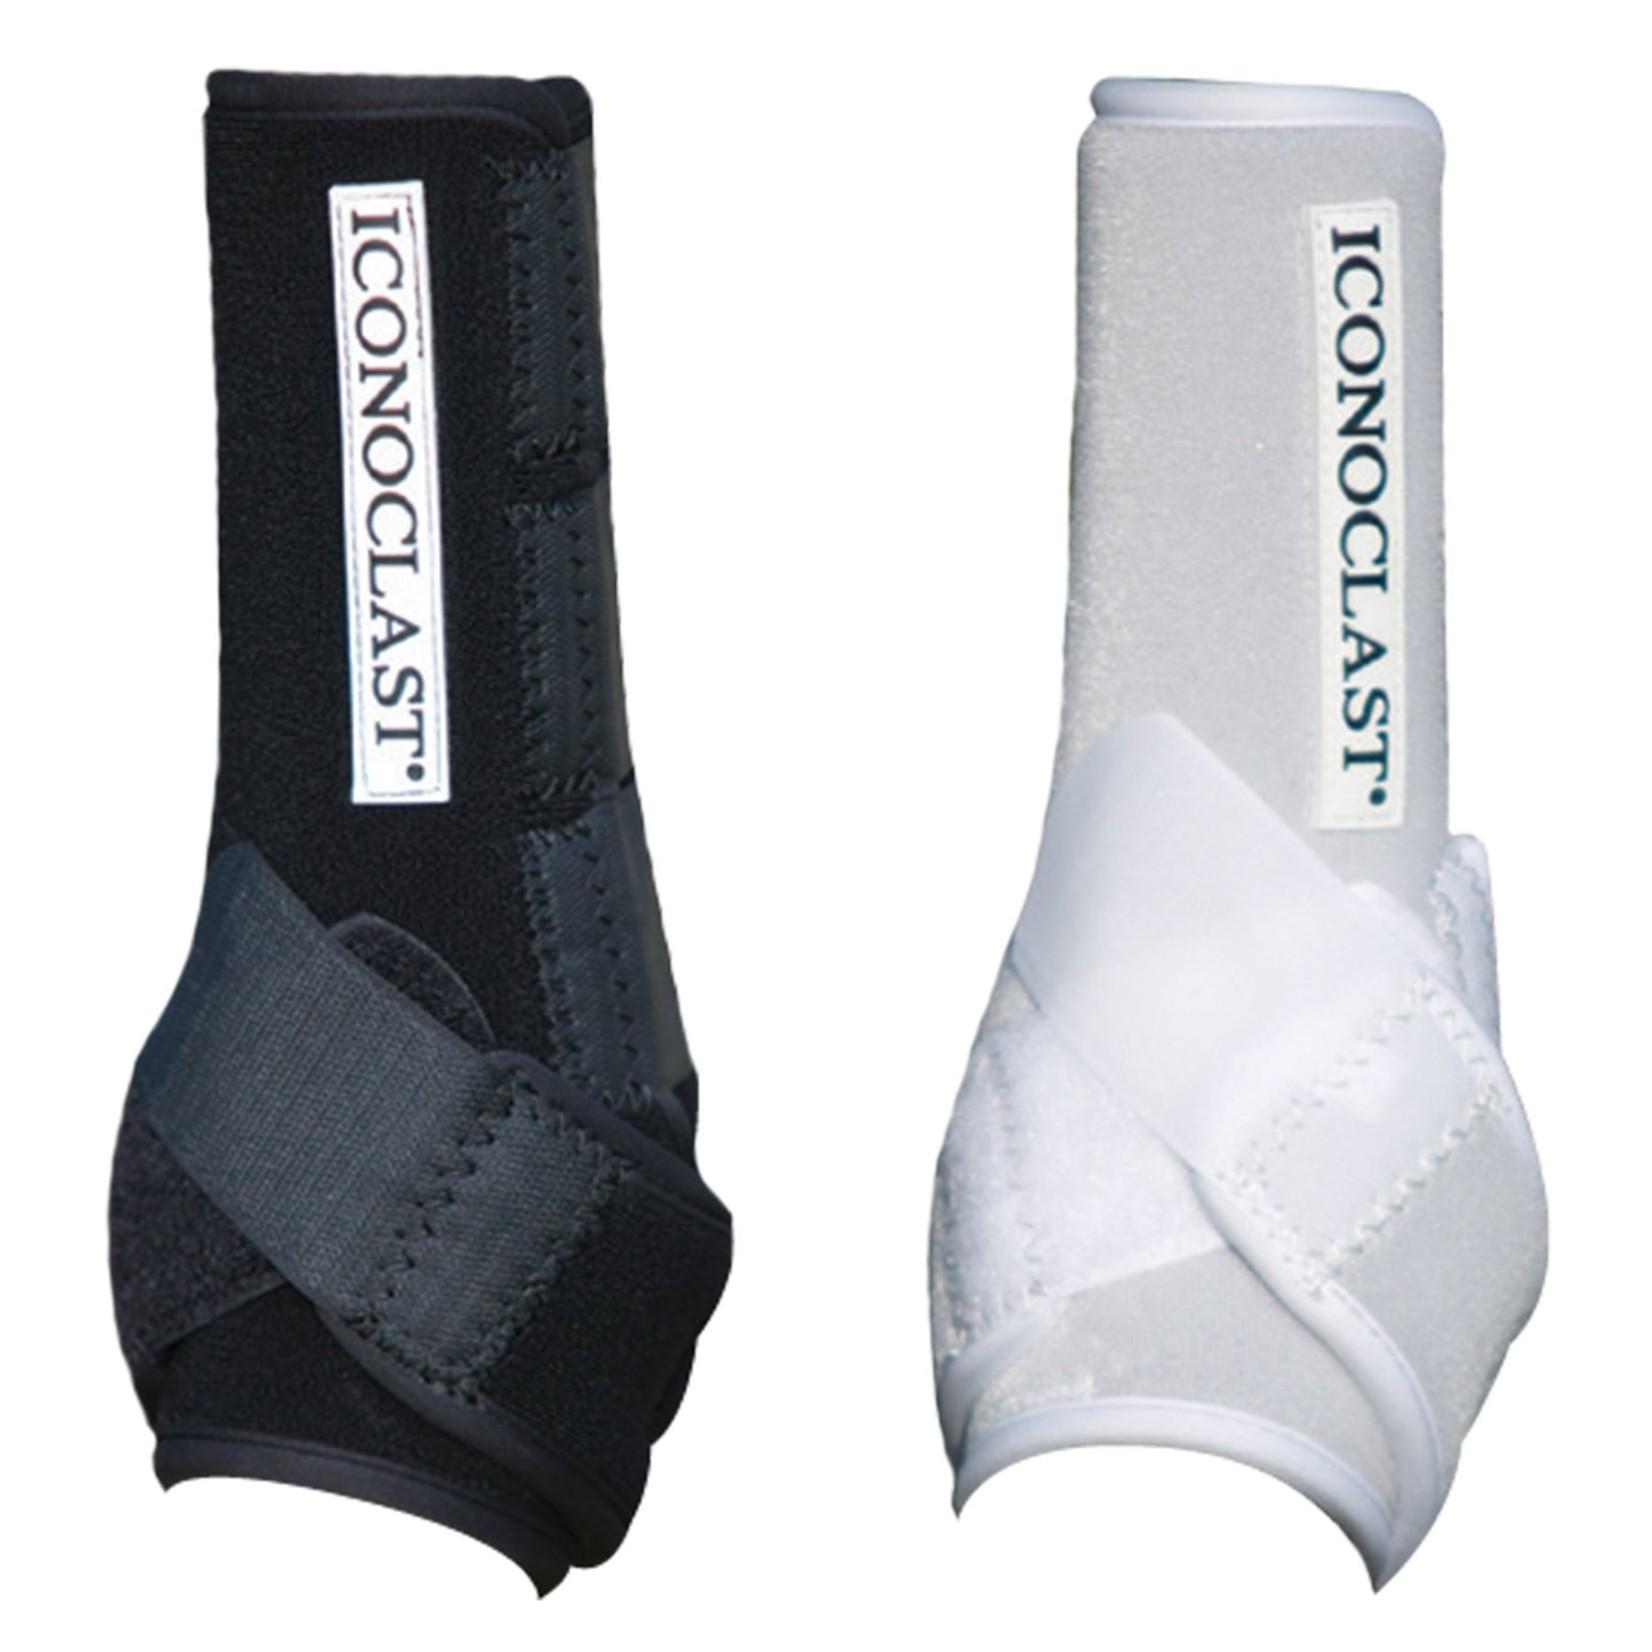 Iconoclast F Boots - Blk/Lrg